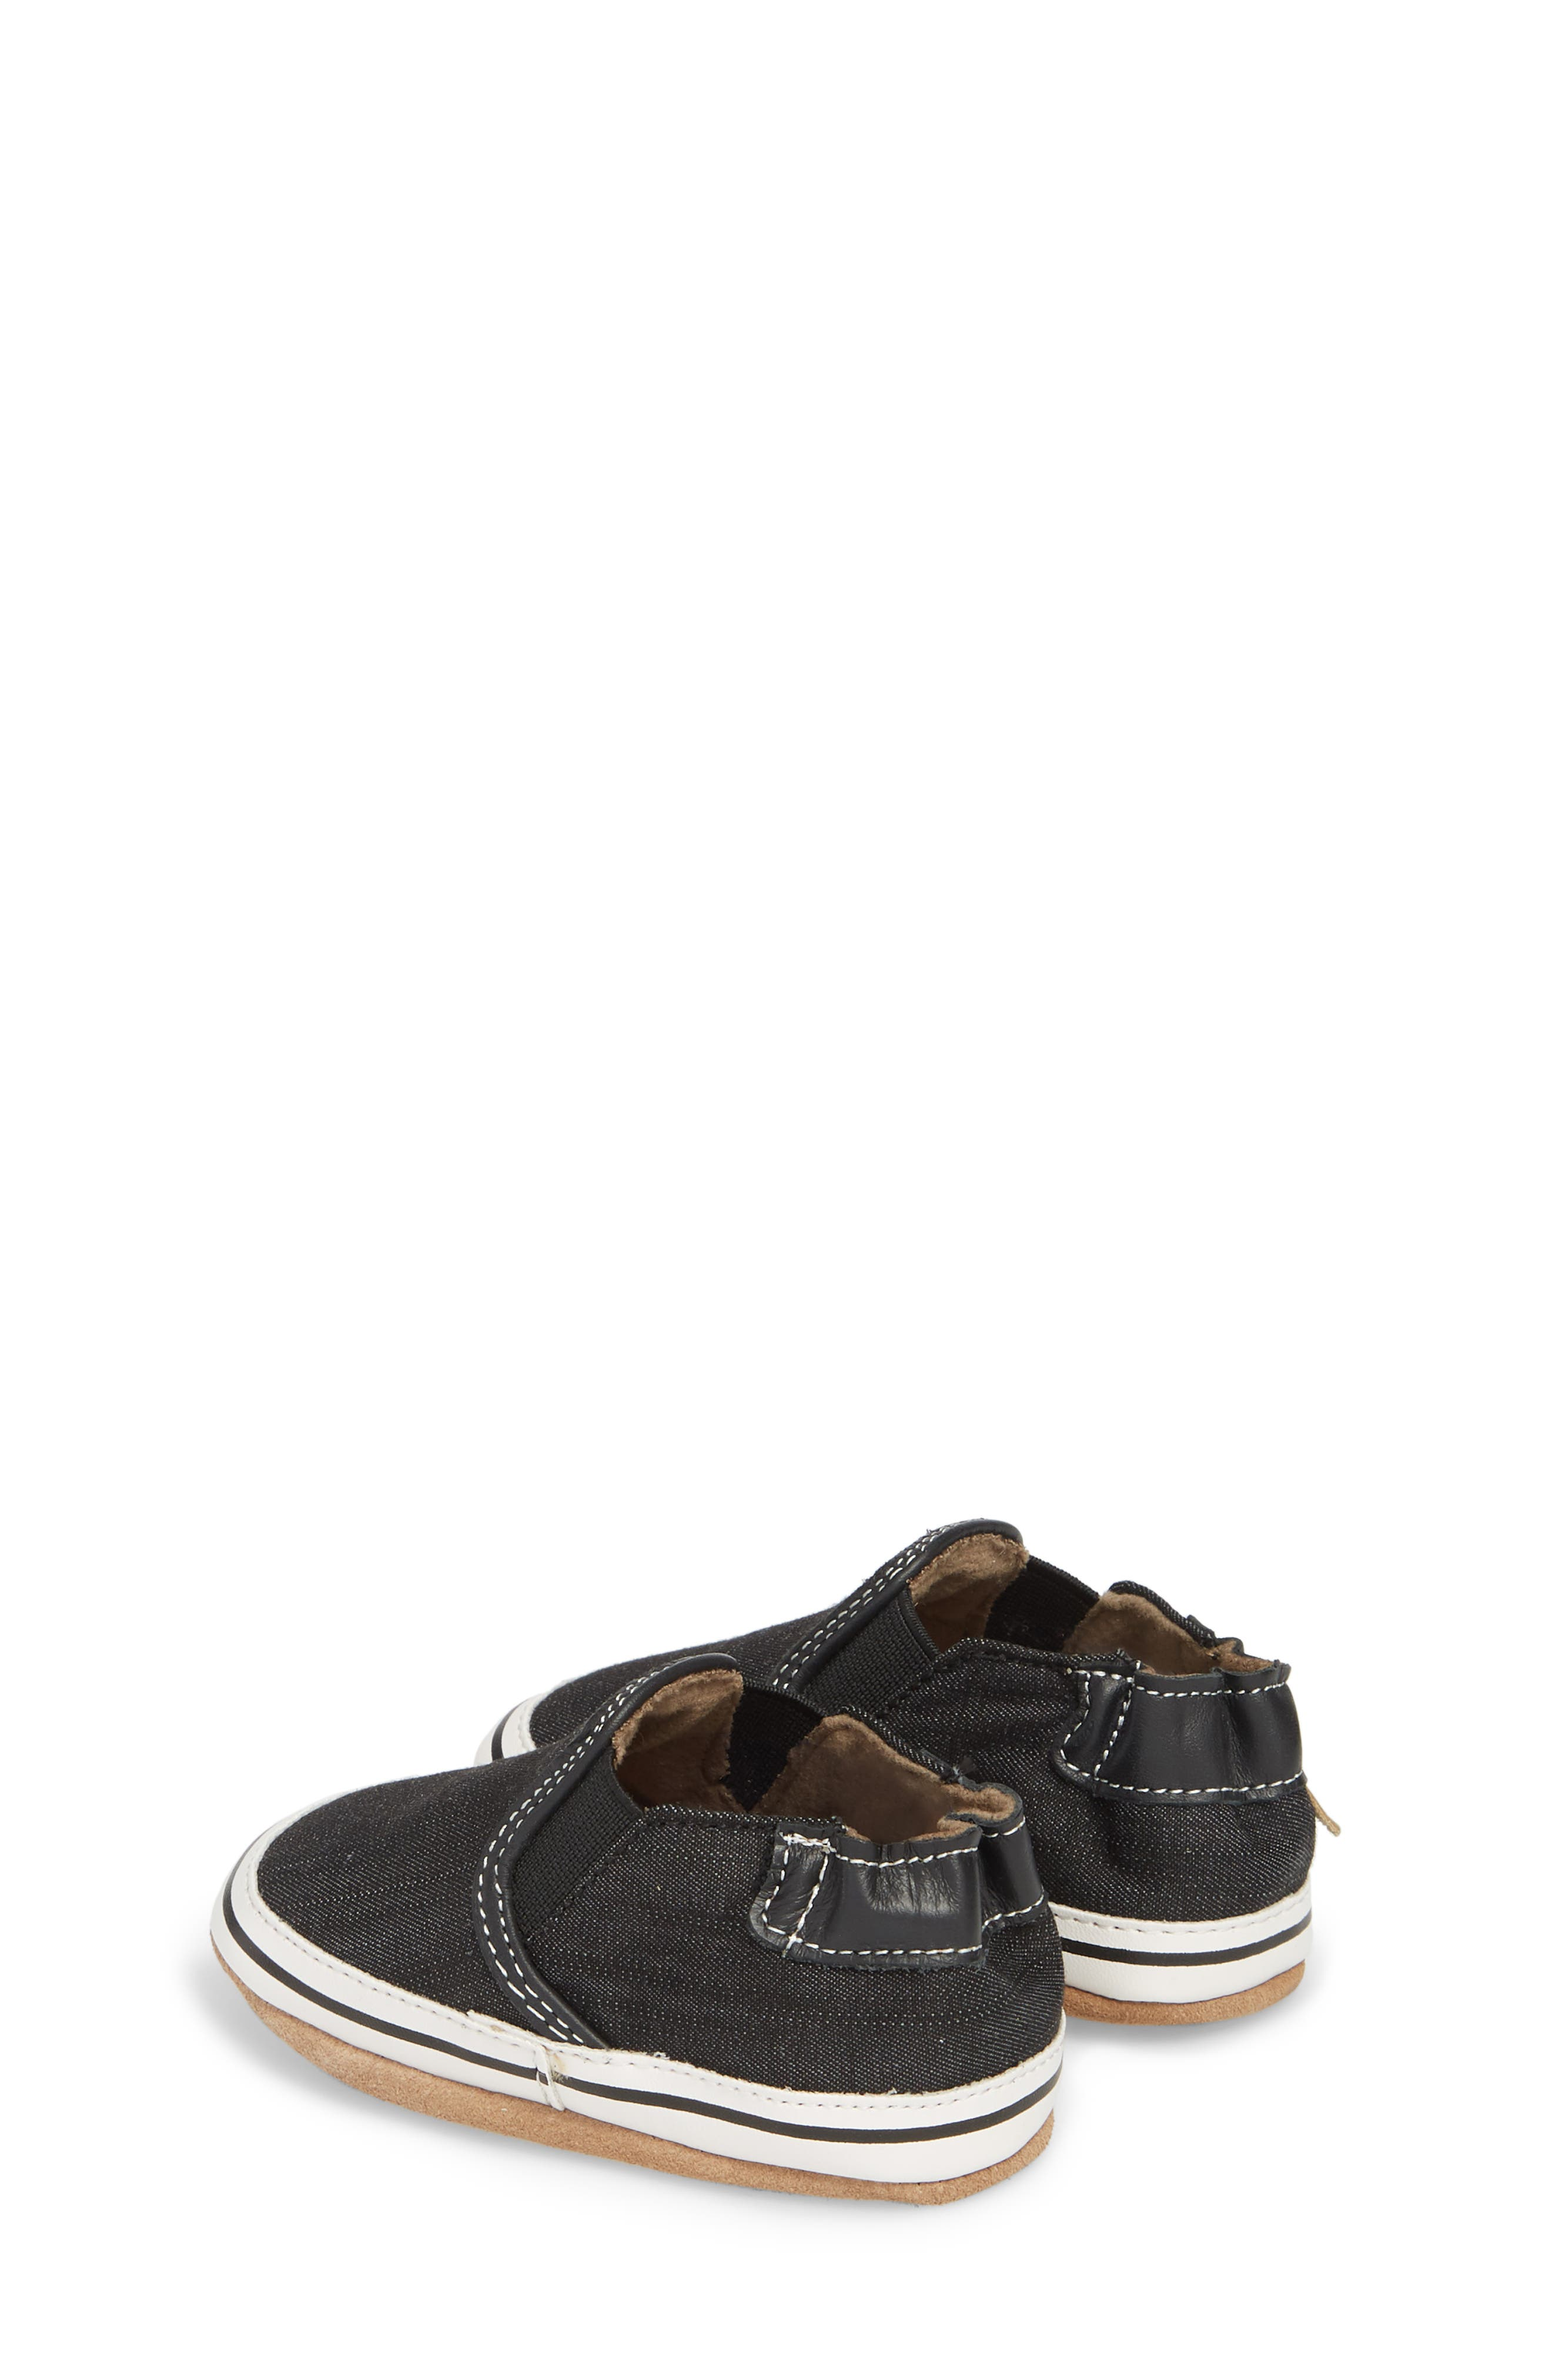 ROBEEZ<SUP>®</SUP>, Liam Slip-On Crib Sneaker, Alternate thumbnail 2, color, BLACK